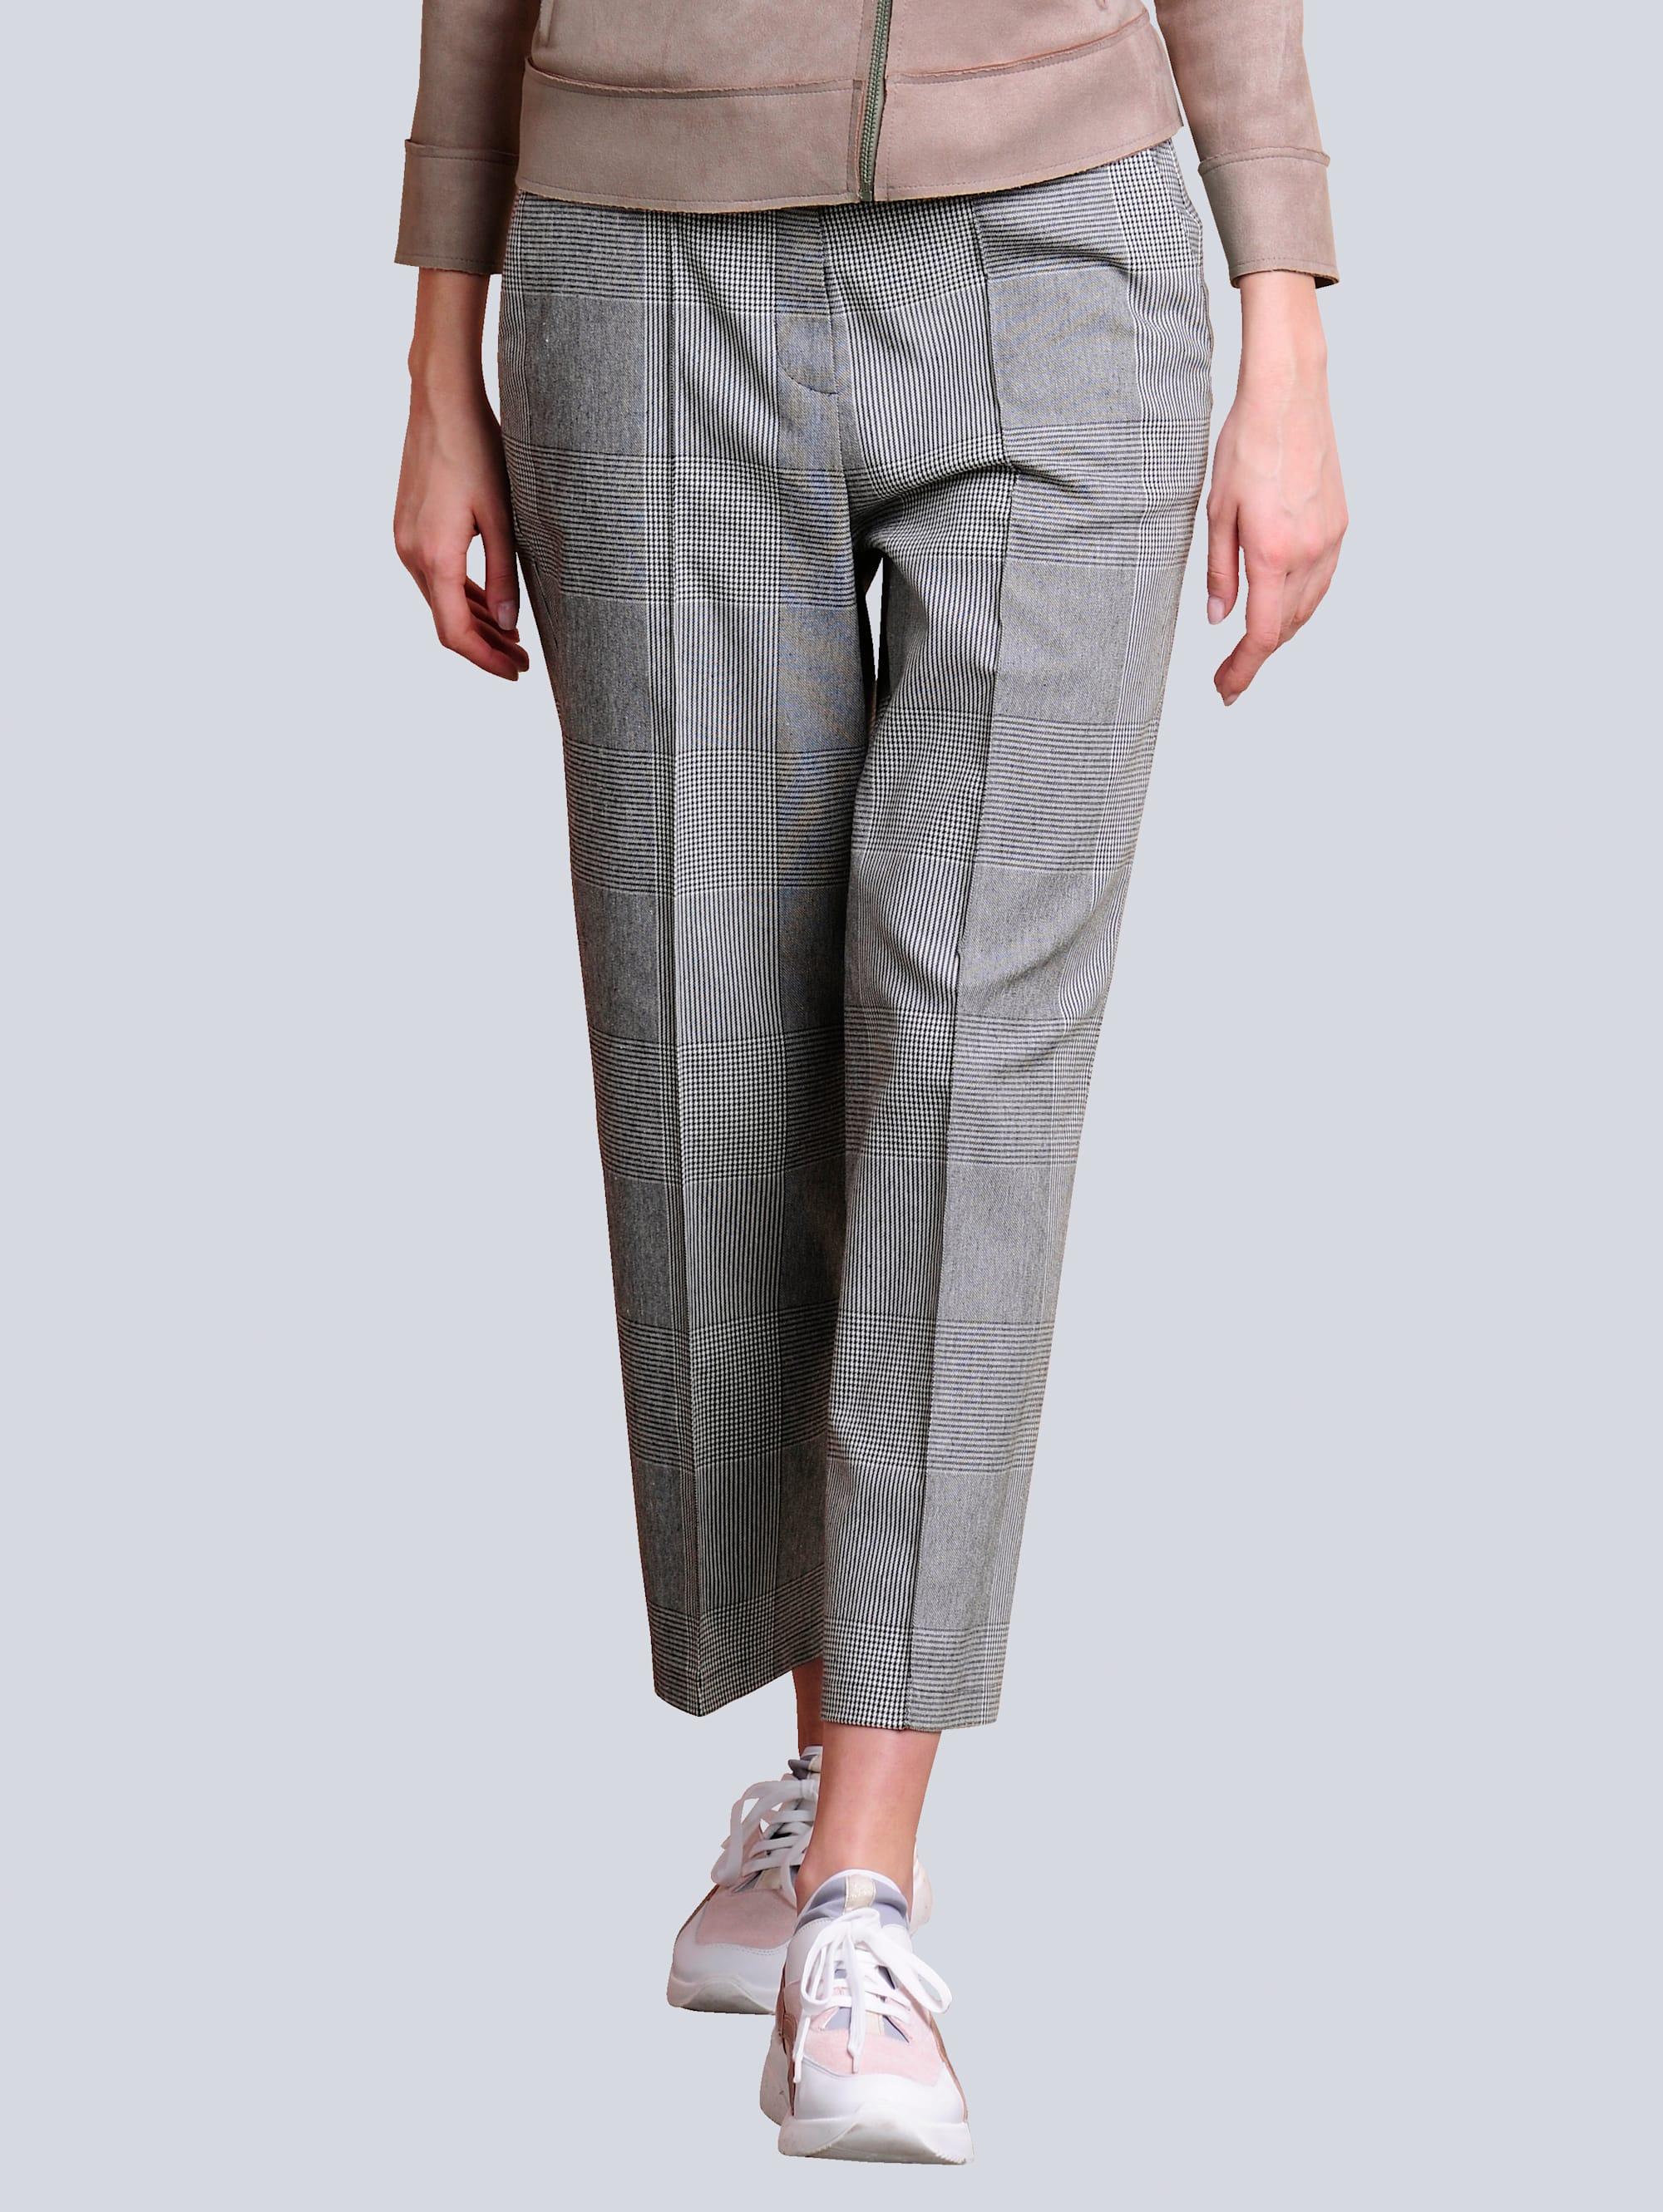 alba moda -  Culotte, in trendiger Culotteform